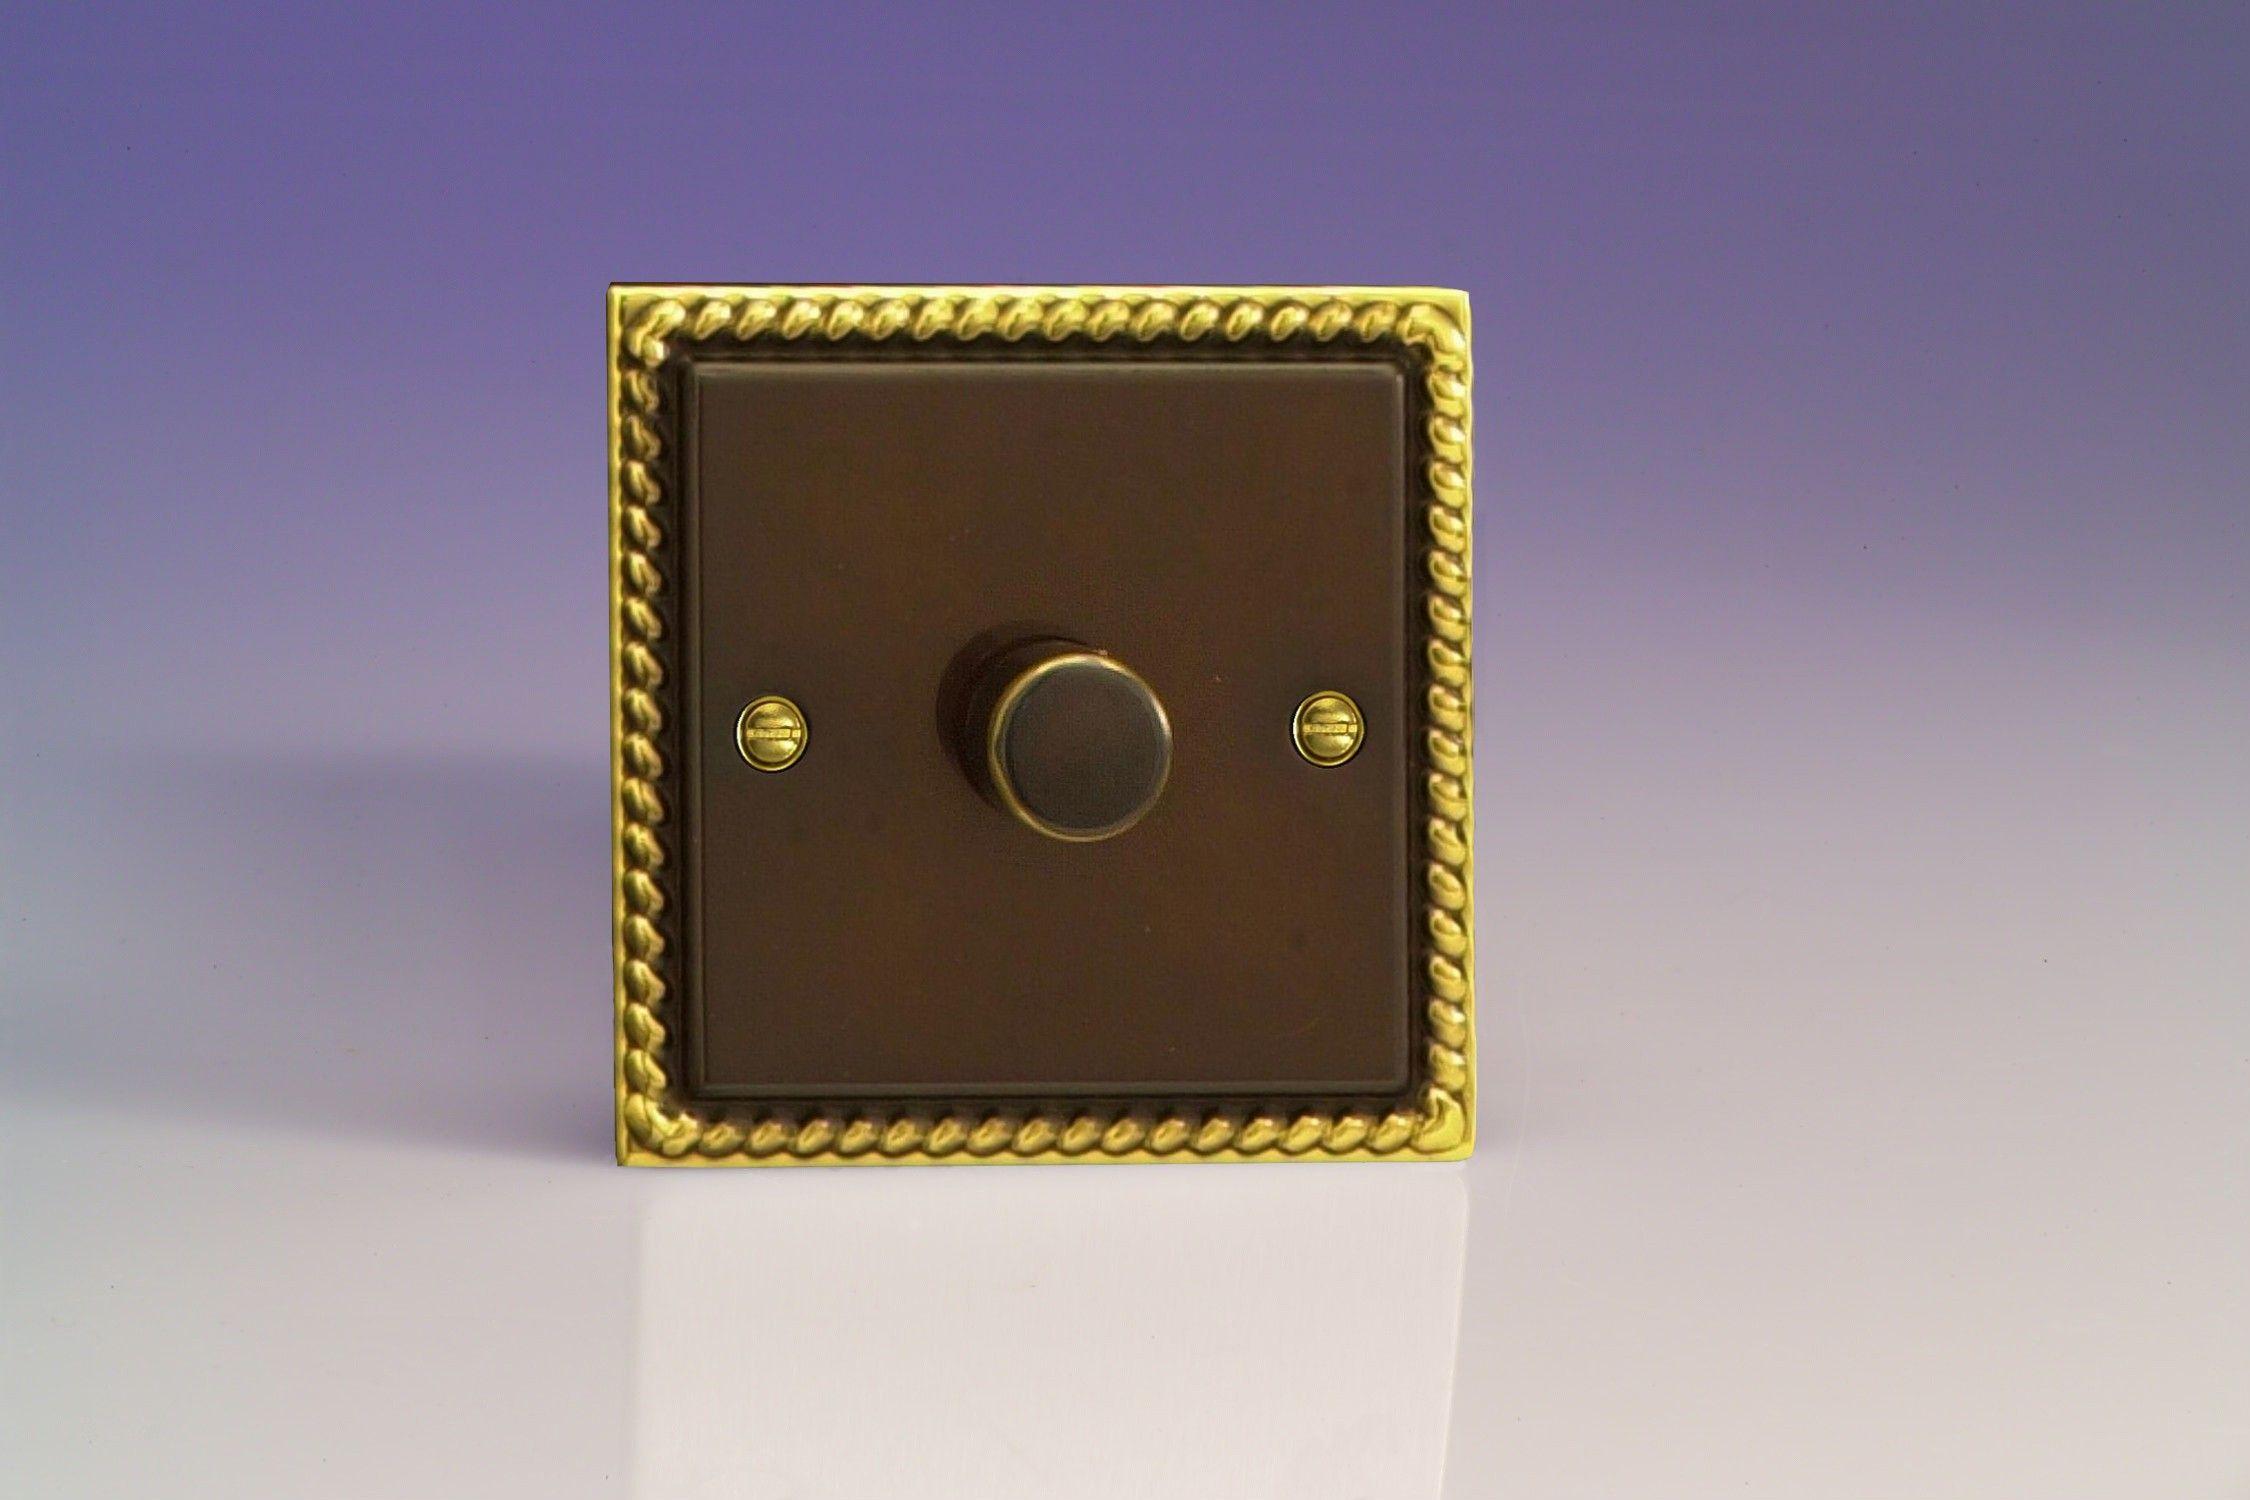 Varilight V Pro 1 Gang 2 Way Push On Off Rotary Led Dimmer Light Switch